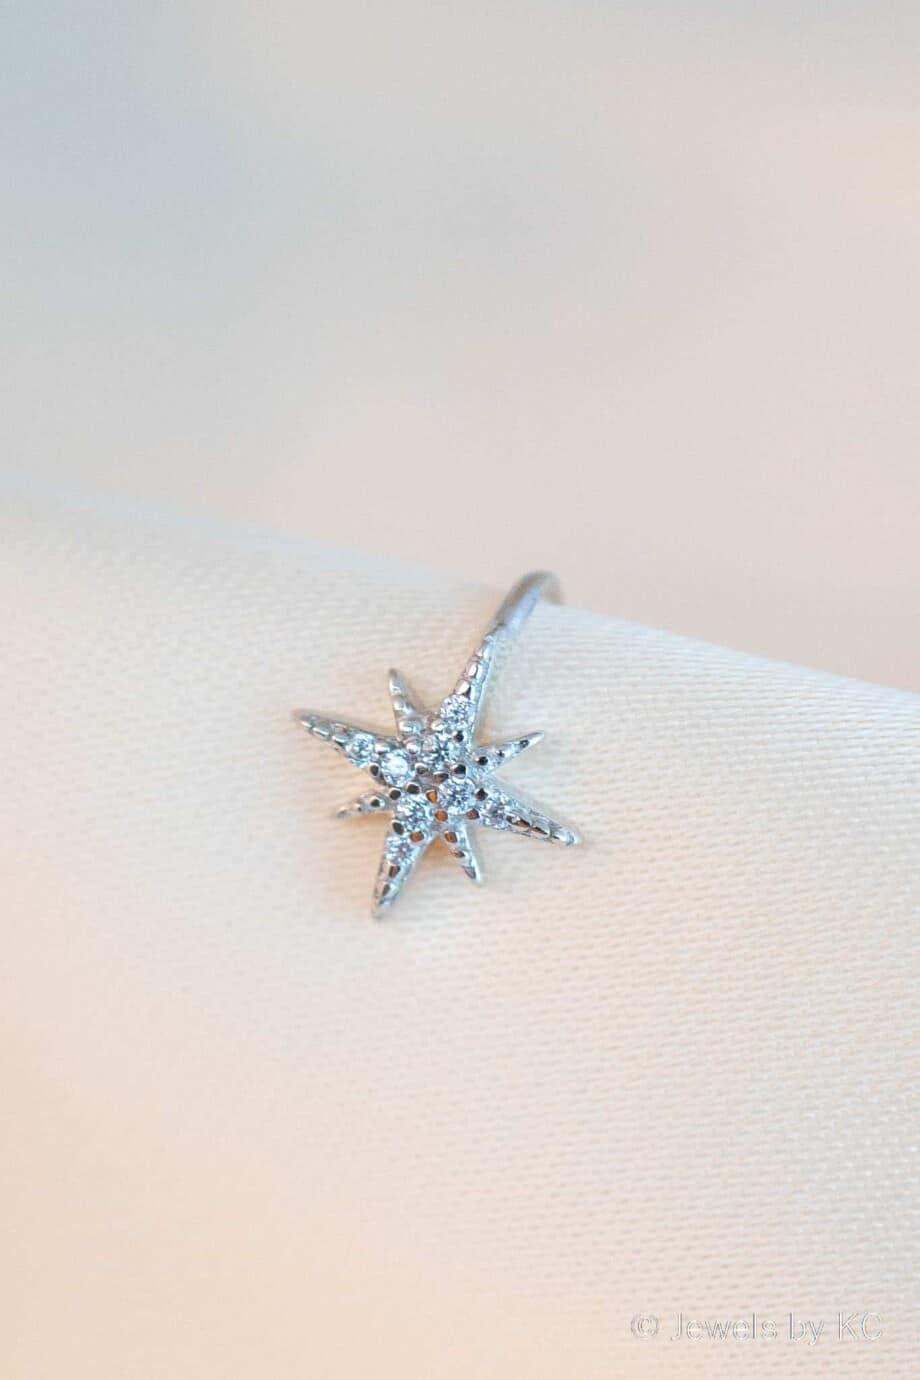 Zilveren ear cuff 'Twinkle' van Sterling Zilver met Zirkonia steentjes